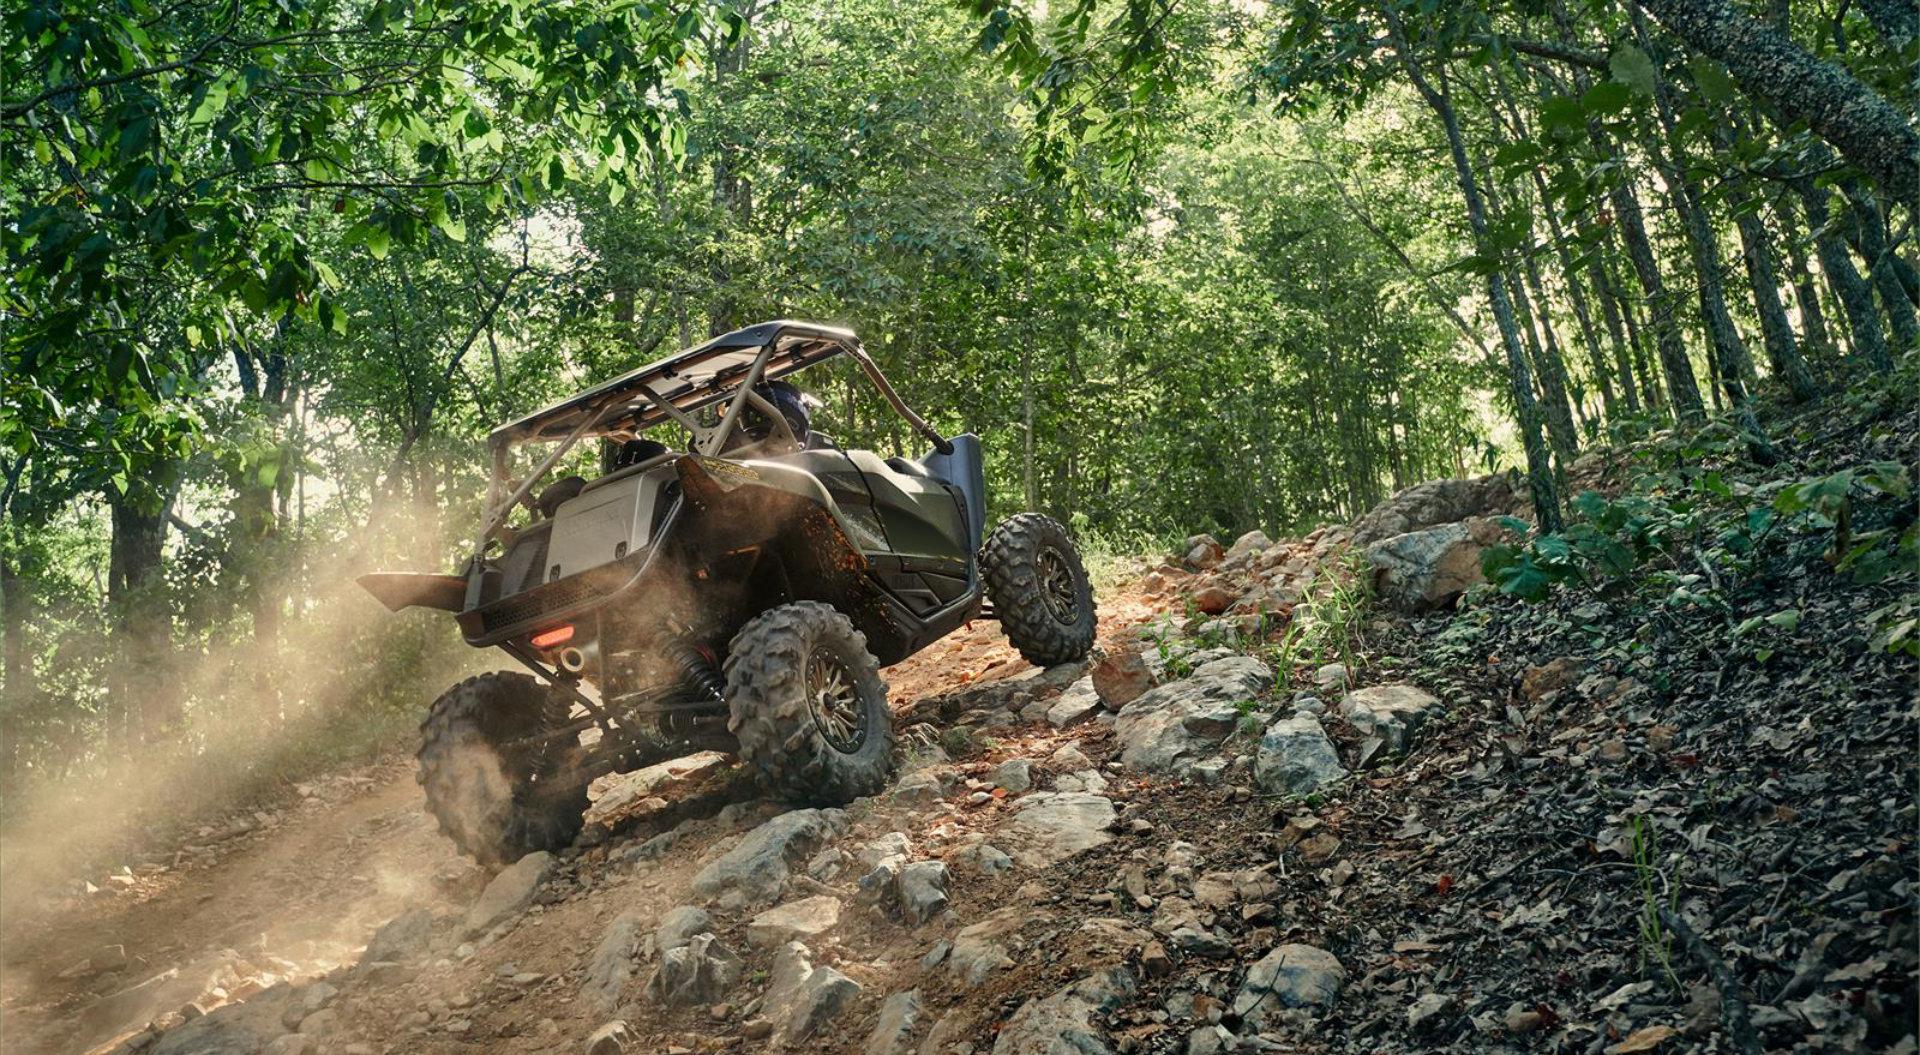 Windrock Park - The South's premier off-road adventure park!